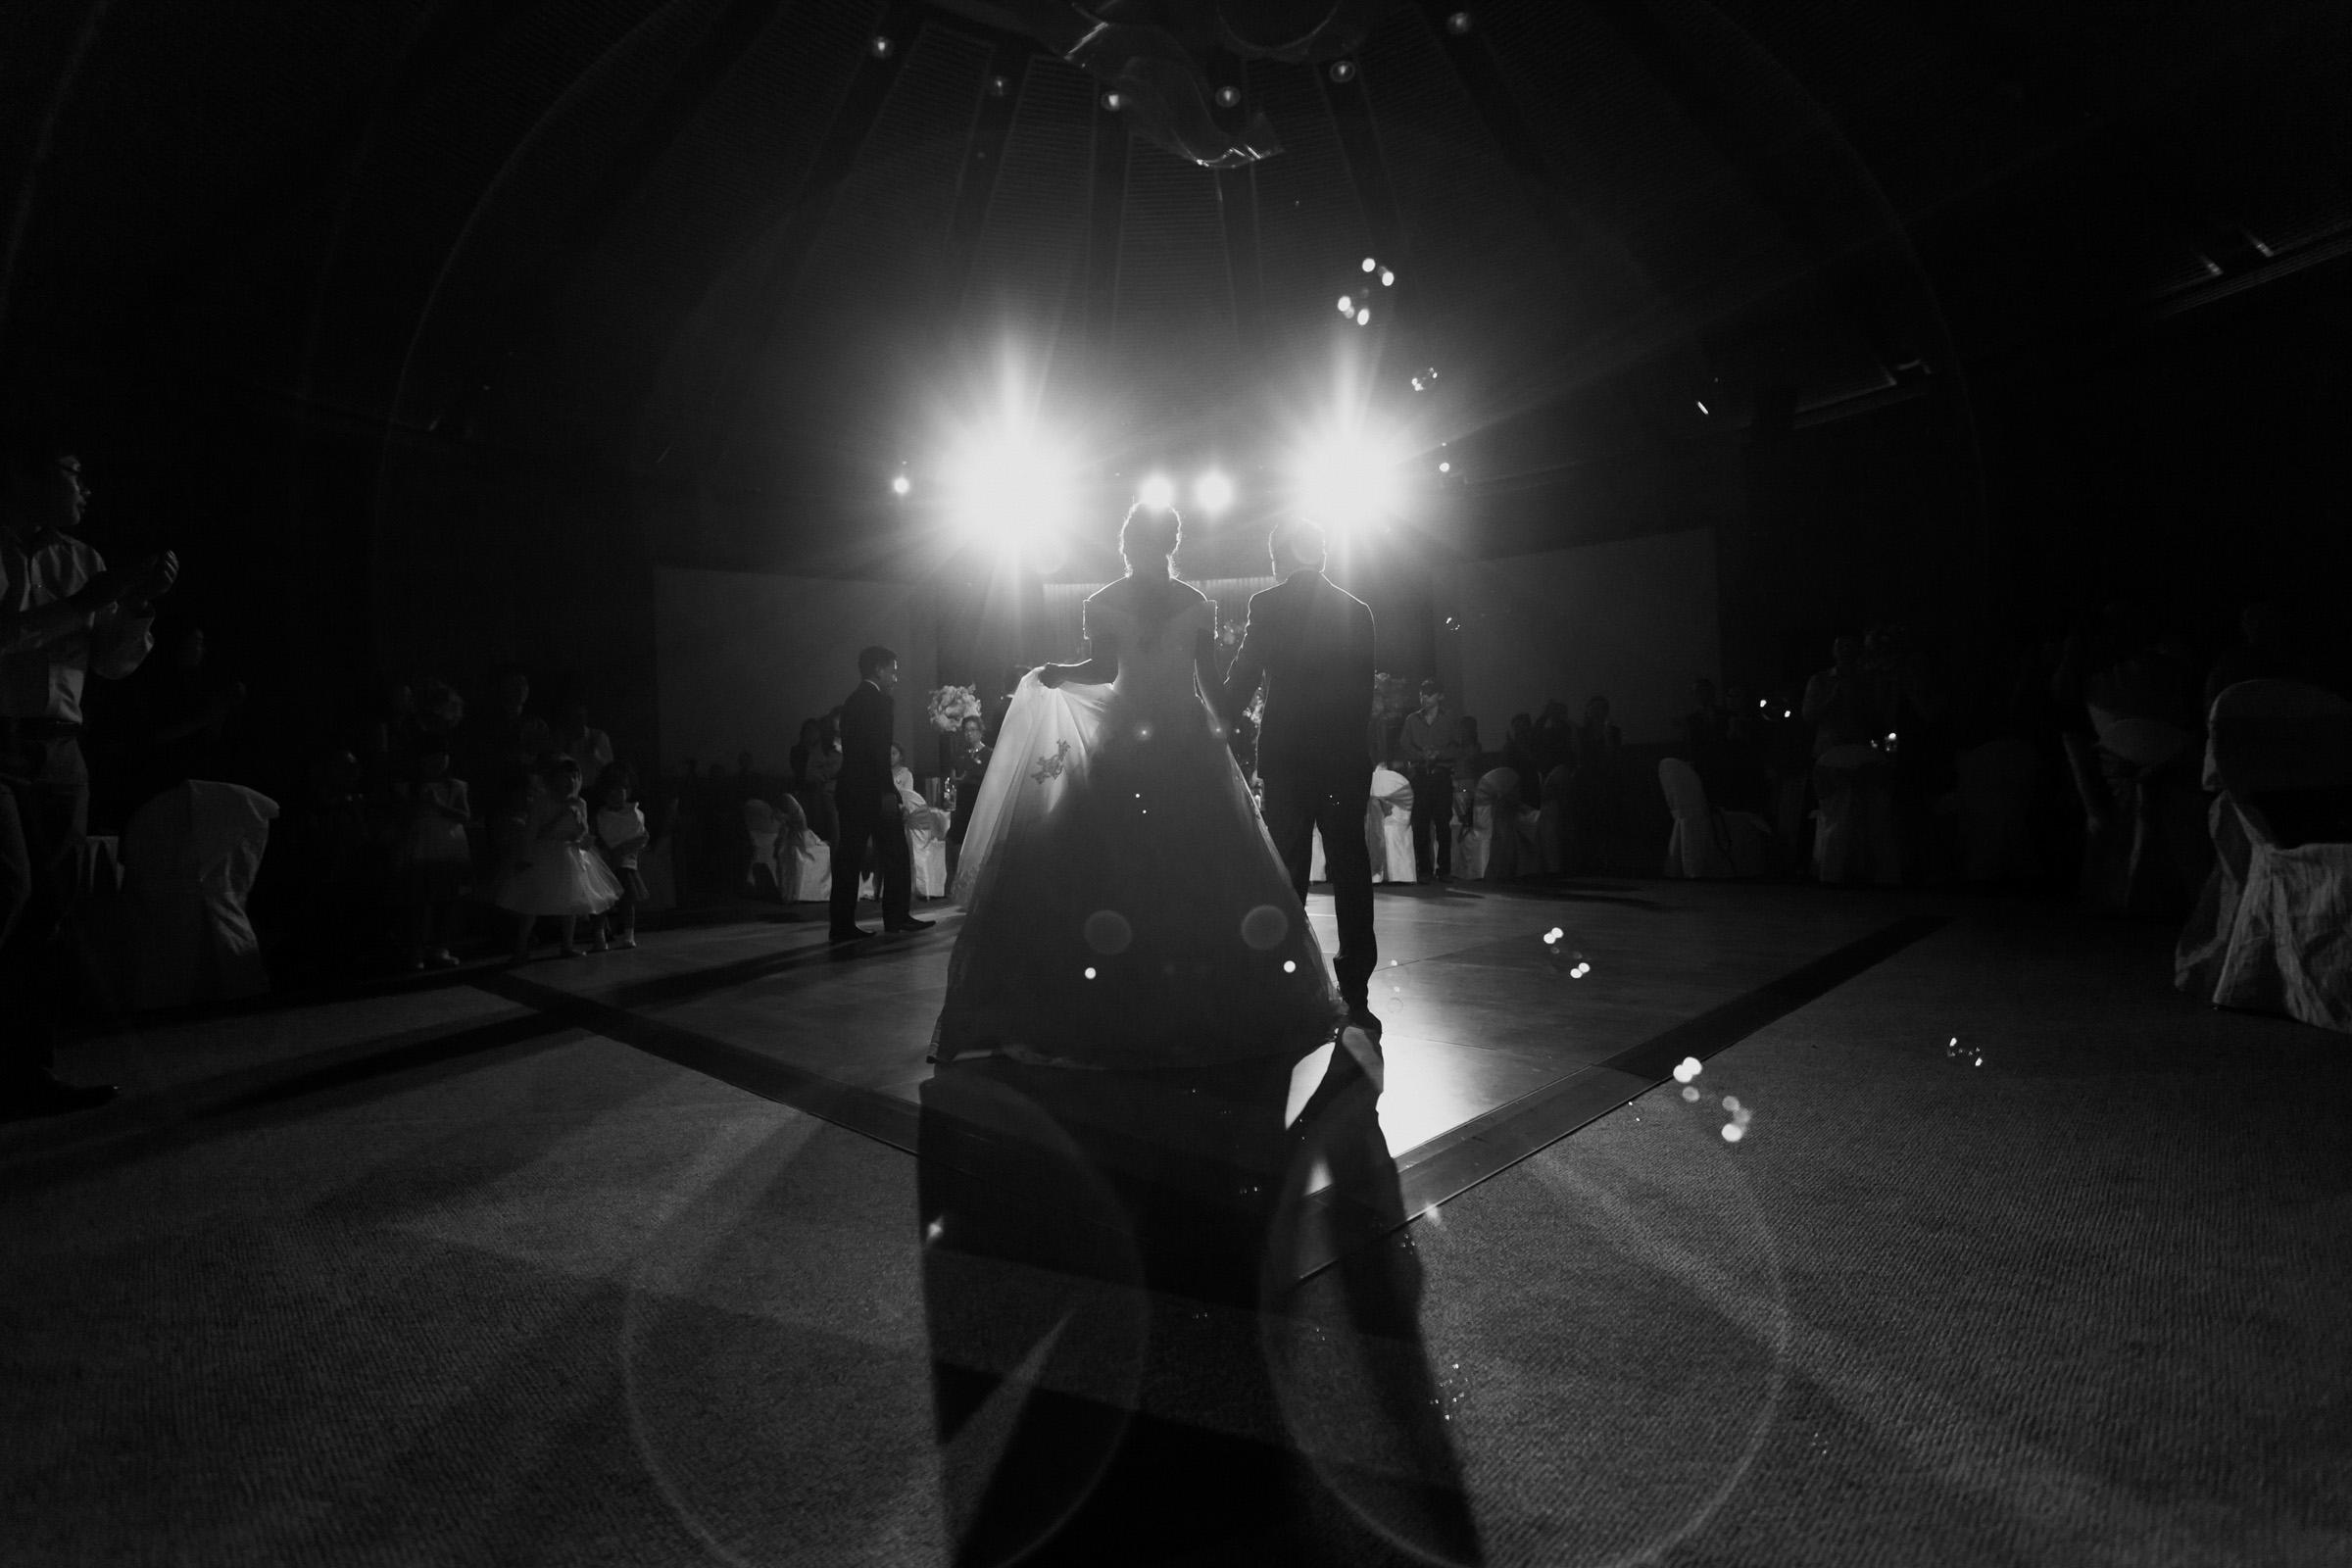 Steven_Jasmine_Wedding_Walldrobe Photography_Wedding shoots_Actual day wedding_Photographer (38)